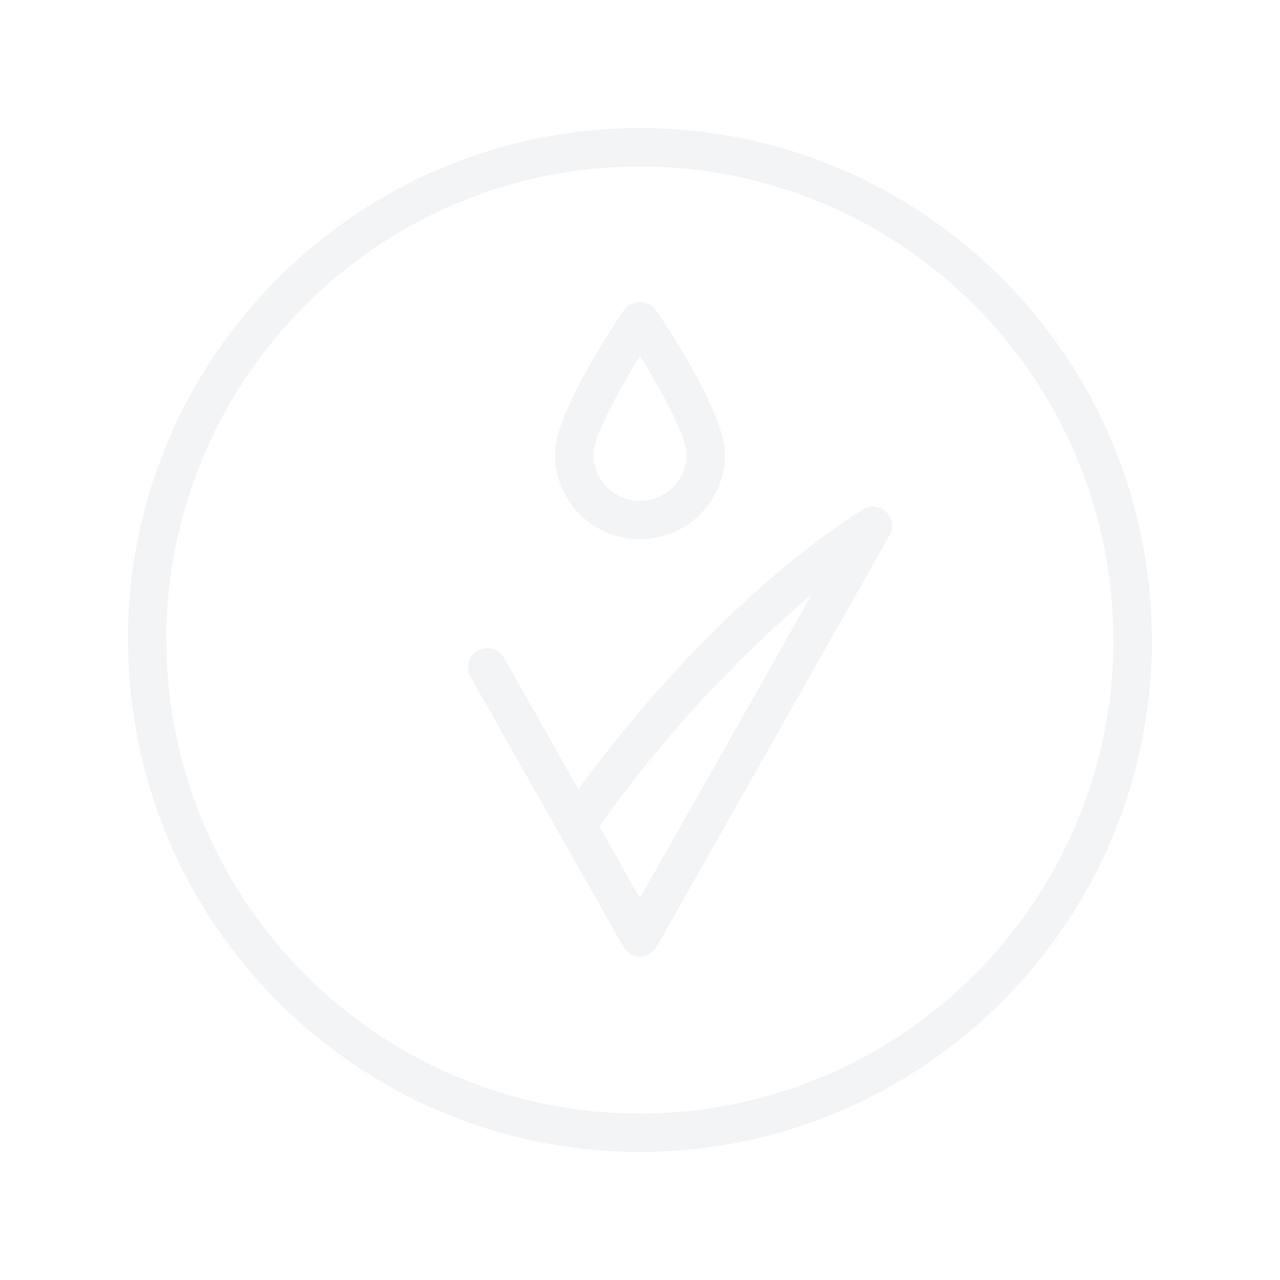 MISSHA All Around Safe Block Waterproof Sunscreen SPF50 50ml